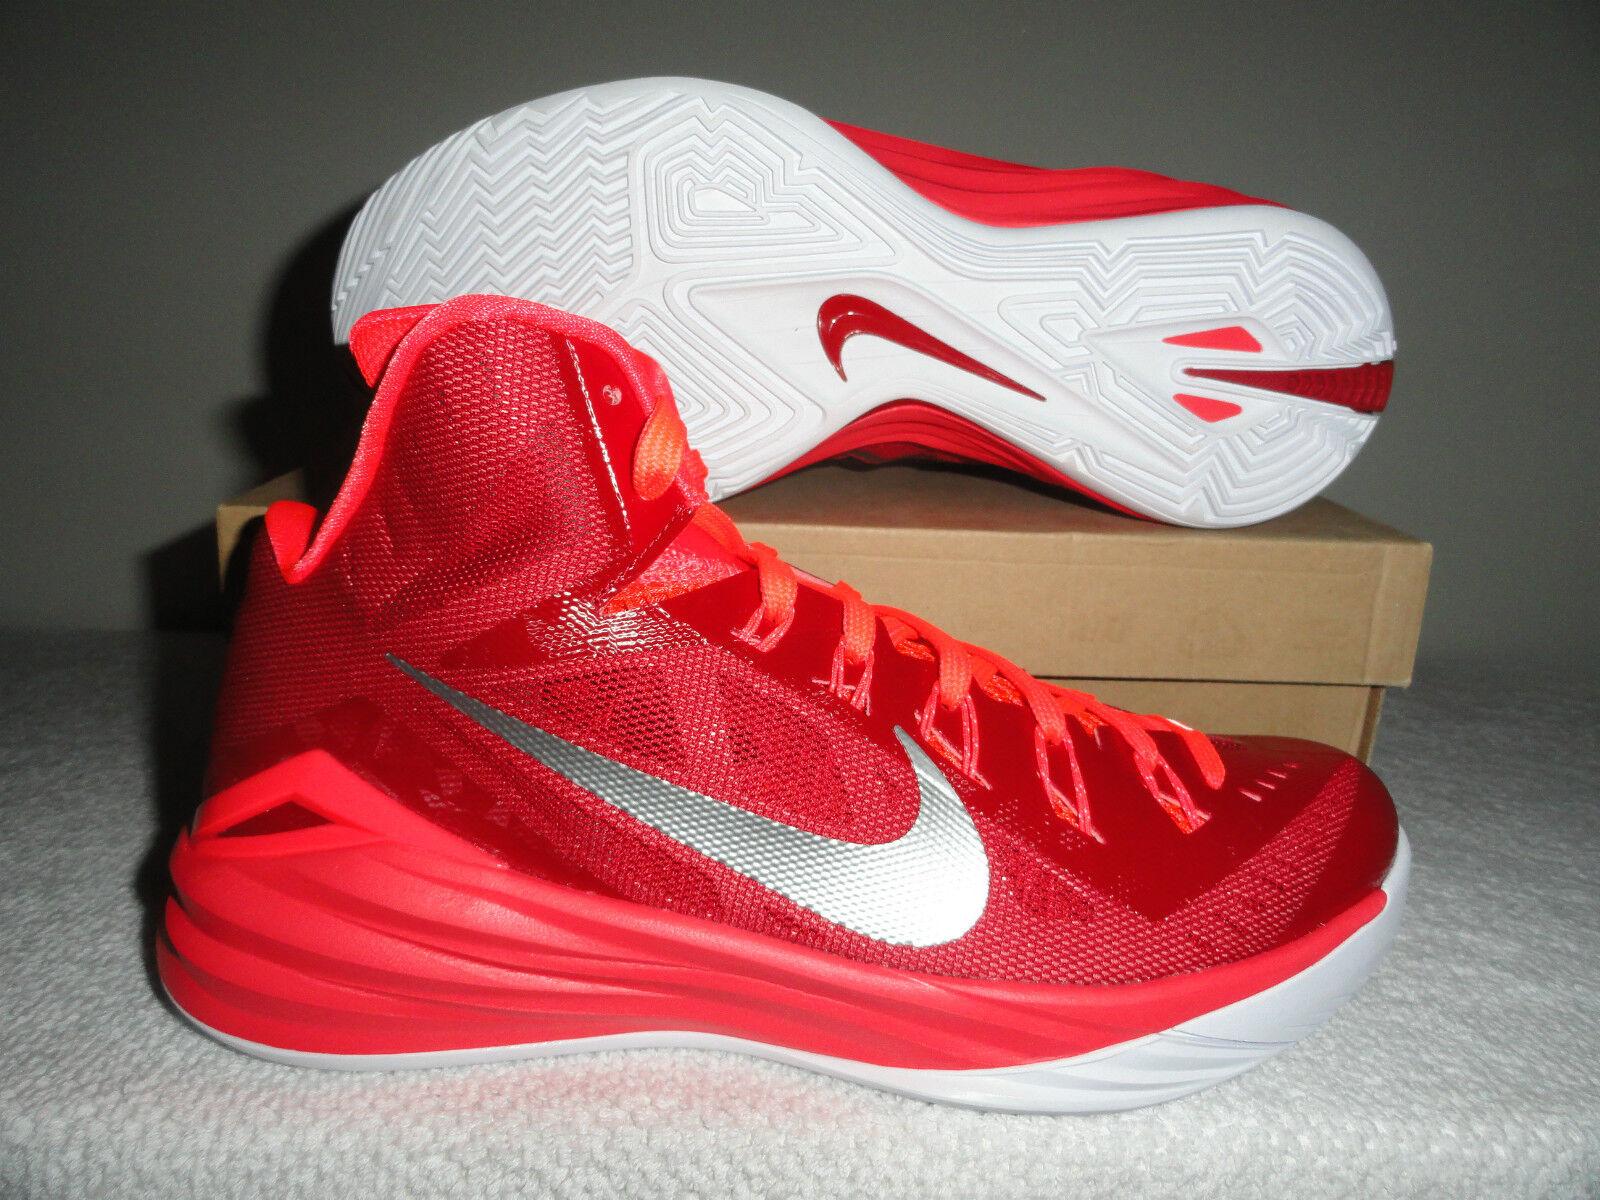 Nike Hyperdunk 2018 TB Men's Basketball Sneakers 11 (New)